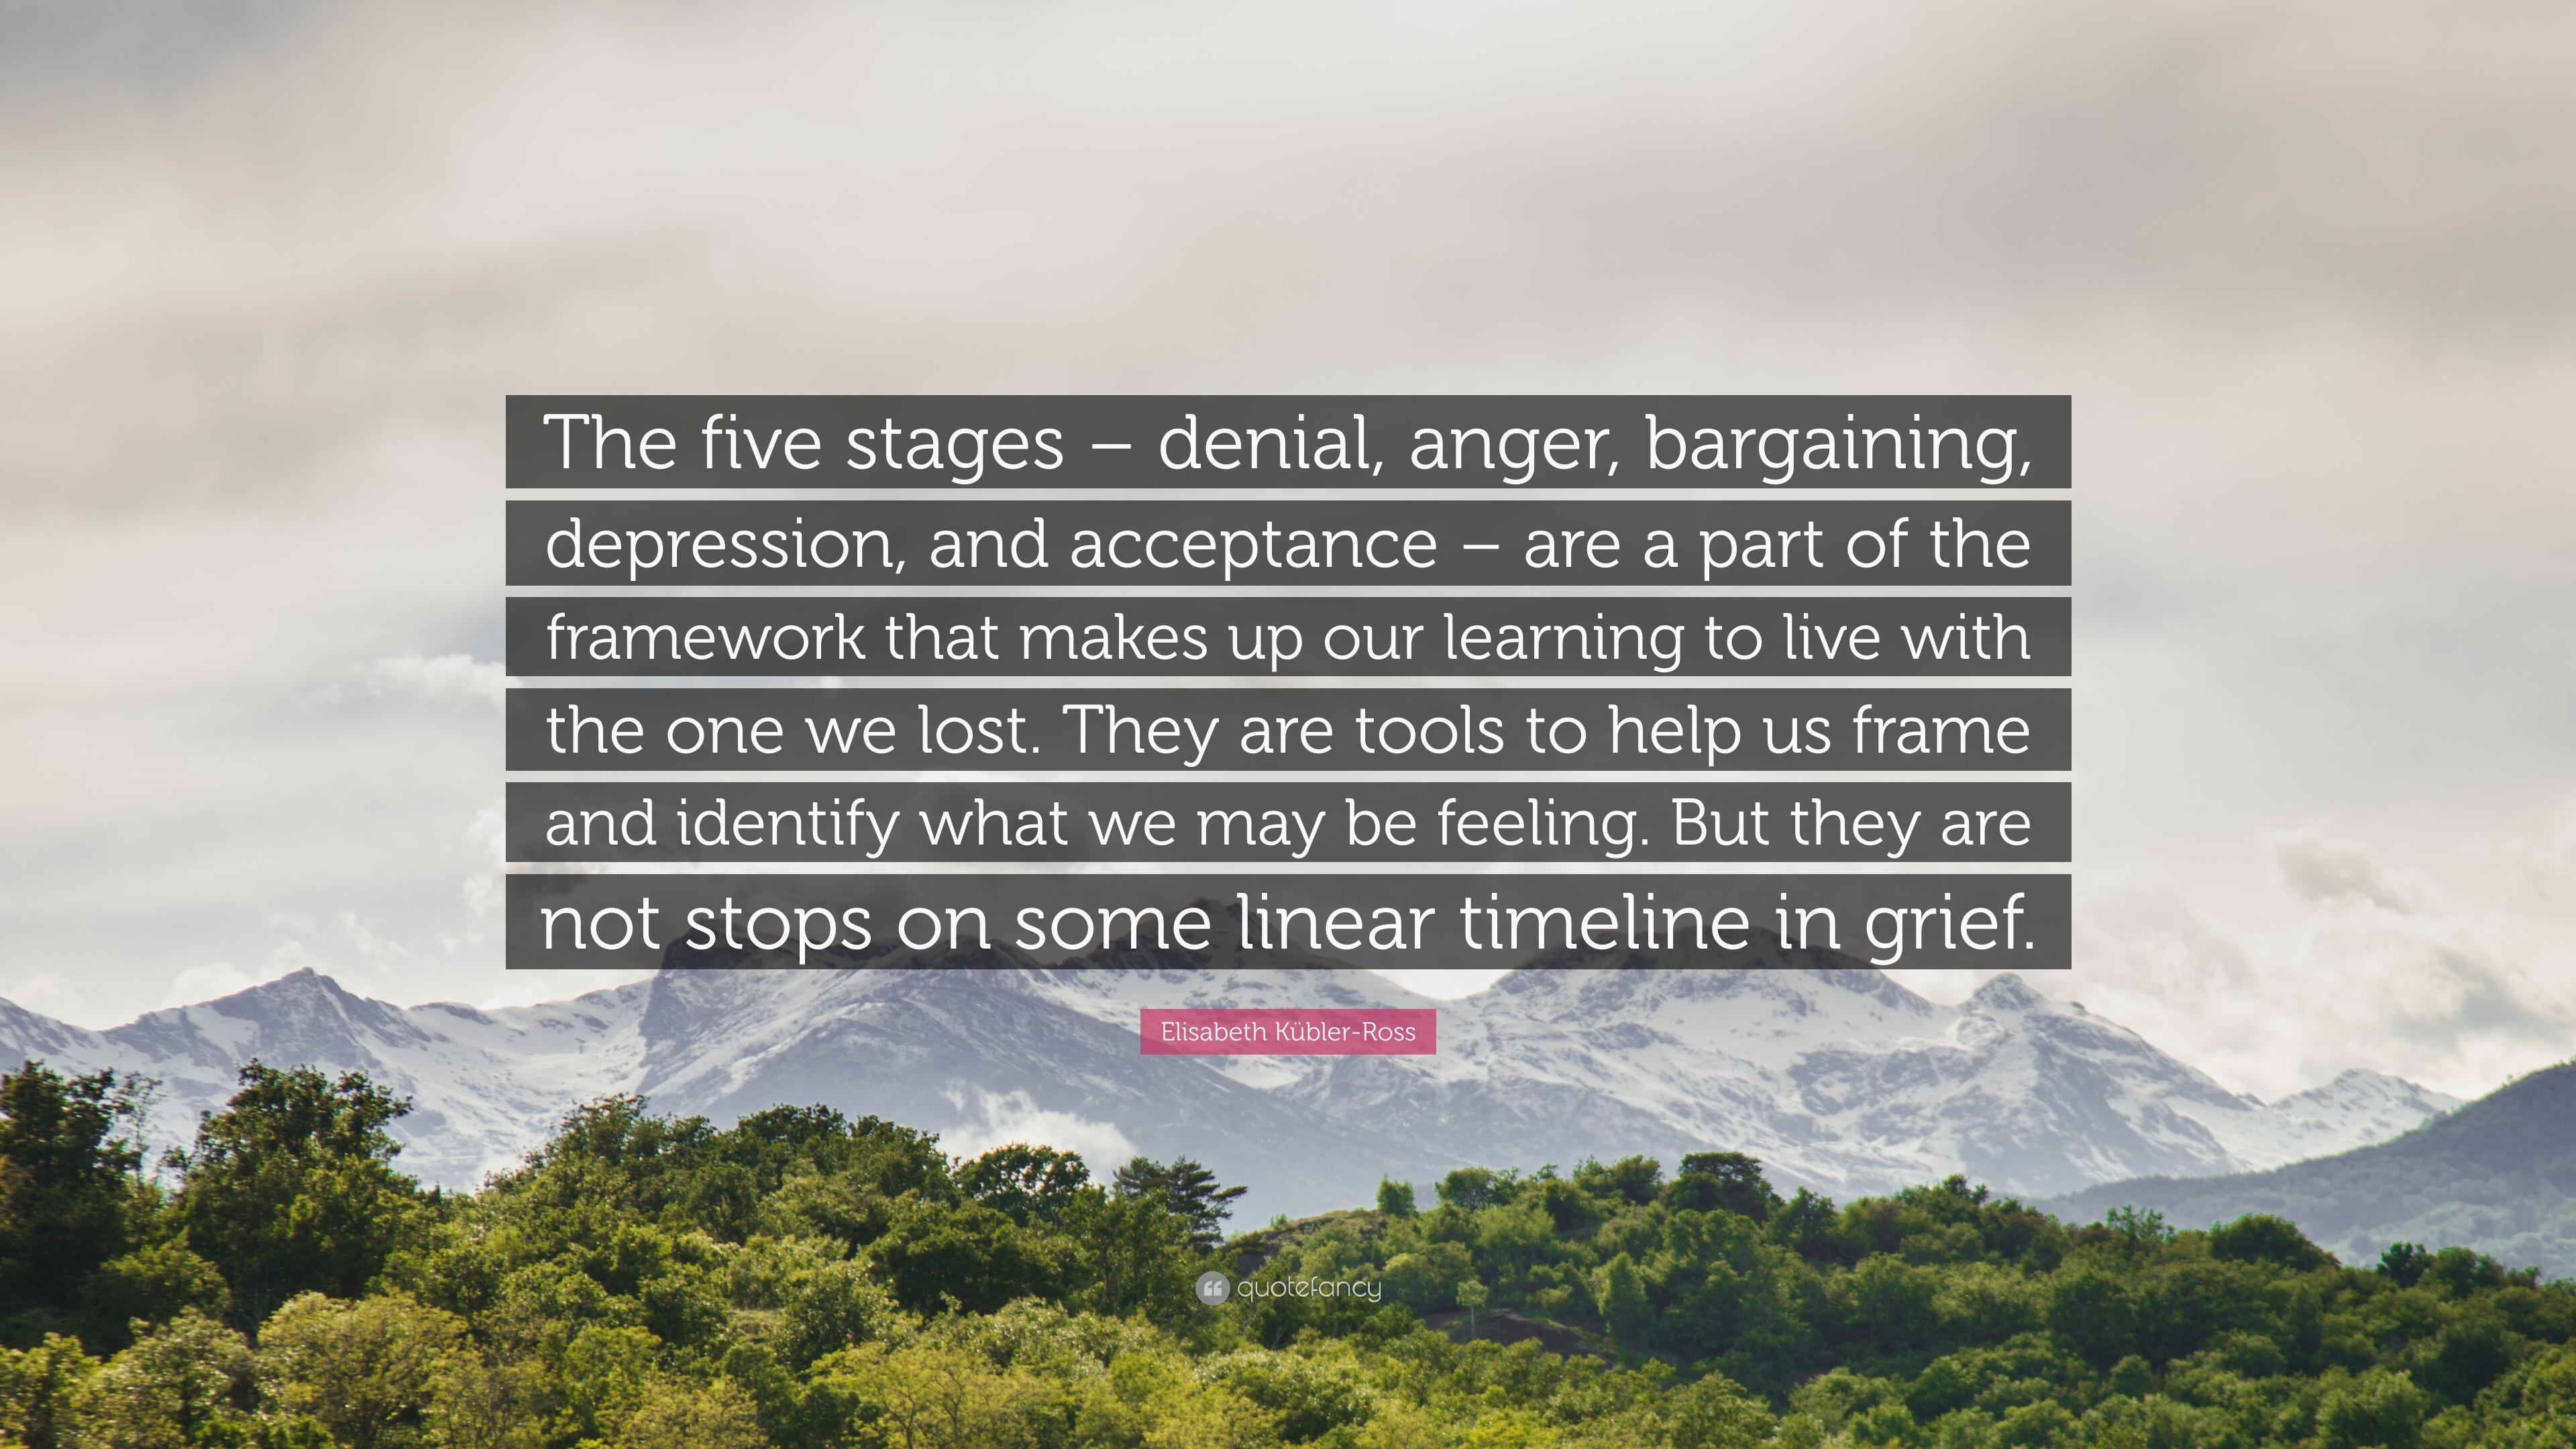 denial anger bargaining depression acceptance